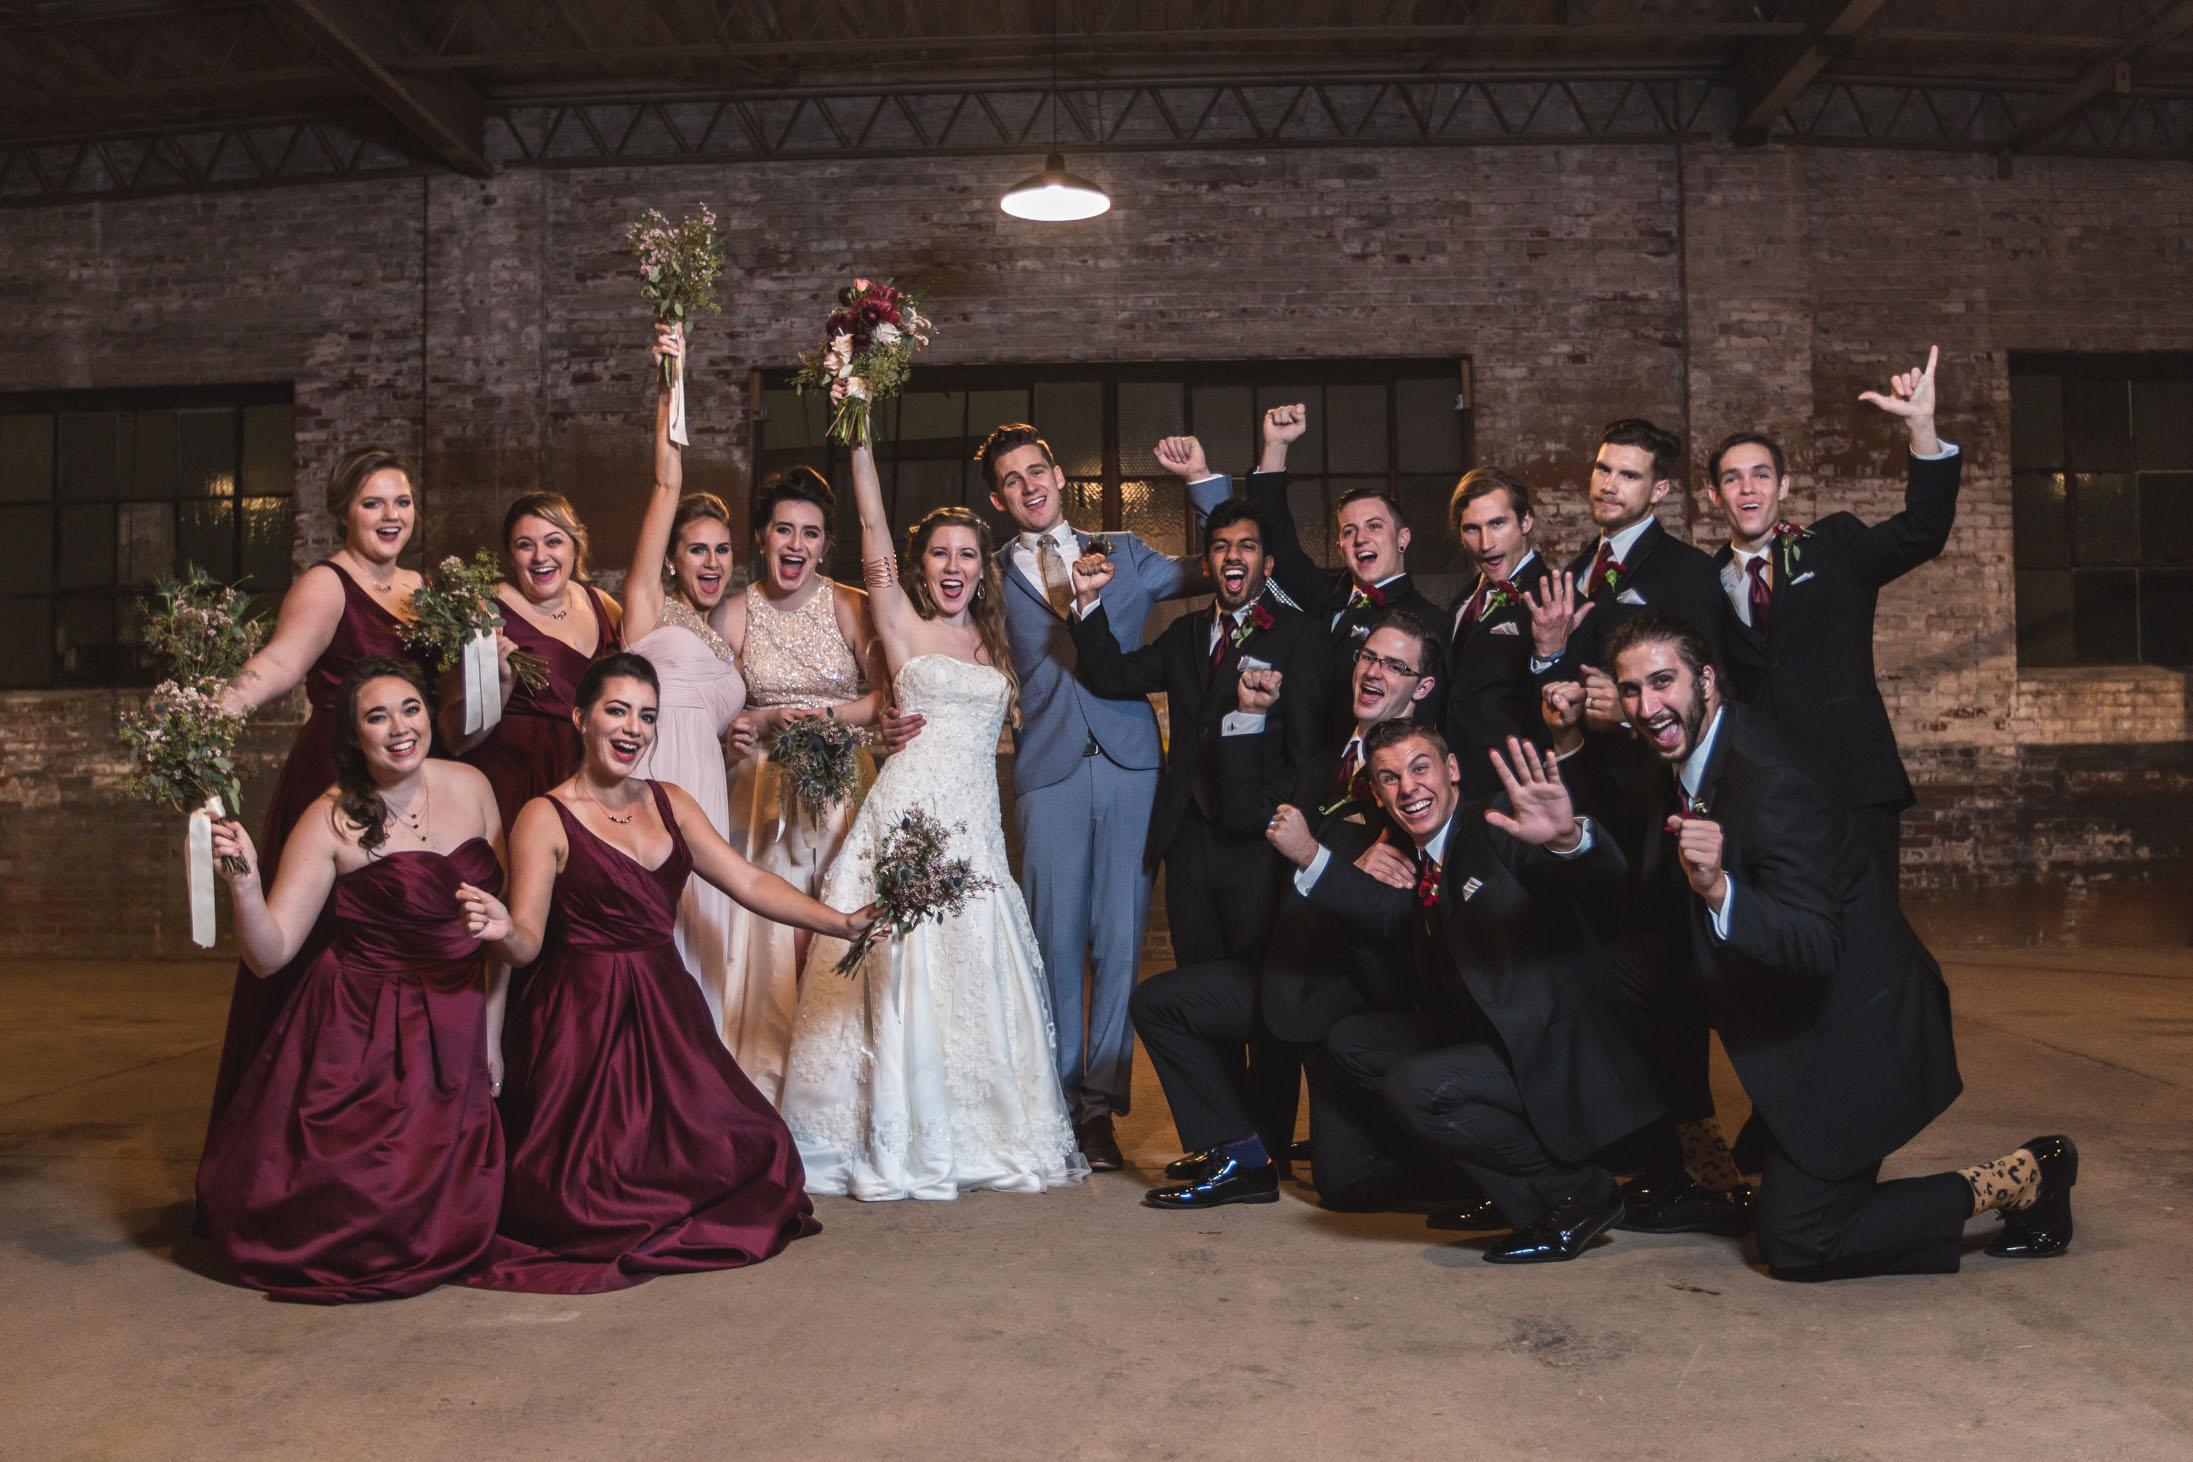 Adam-Szrmack-The-Glass-Factory-Wedding-119.jpg